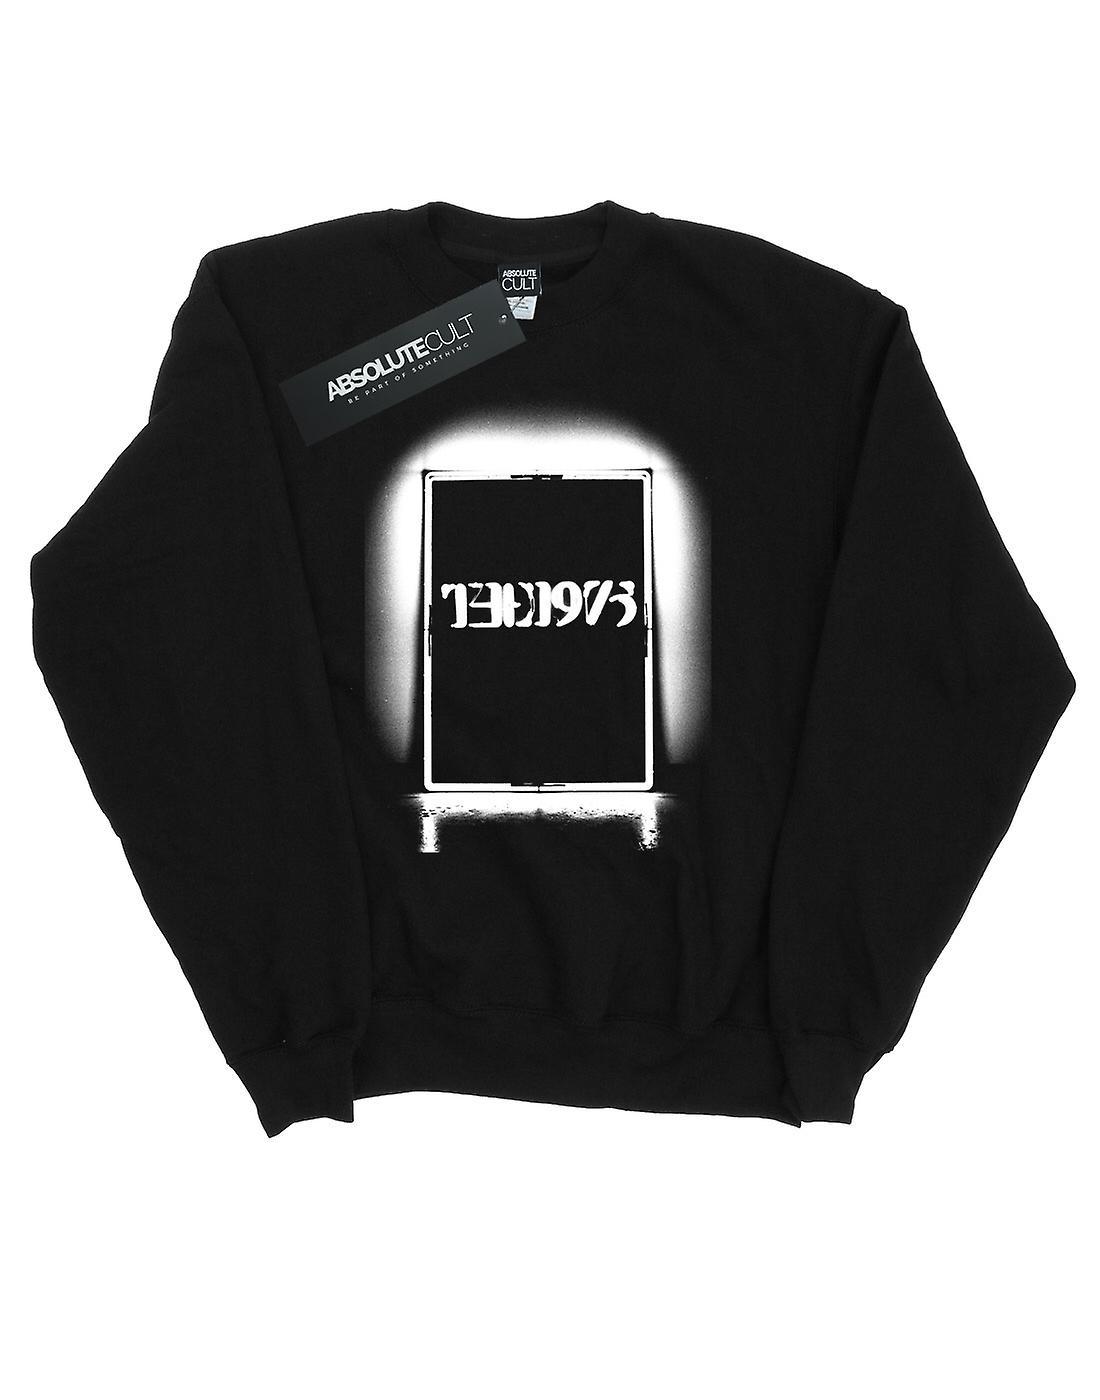 The 1975 Men's Black Tour Sweatshirt